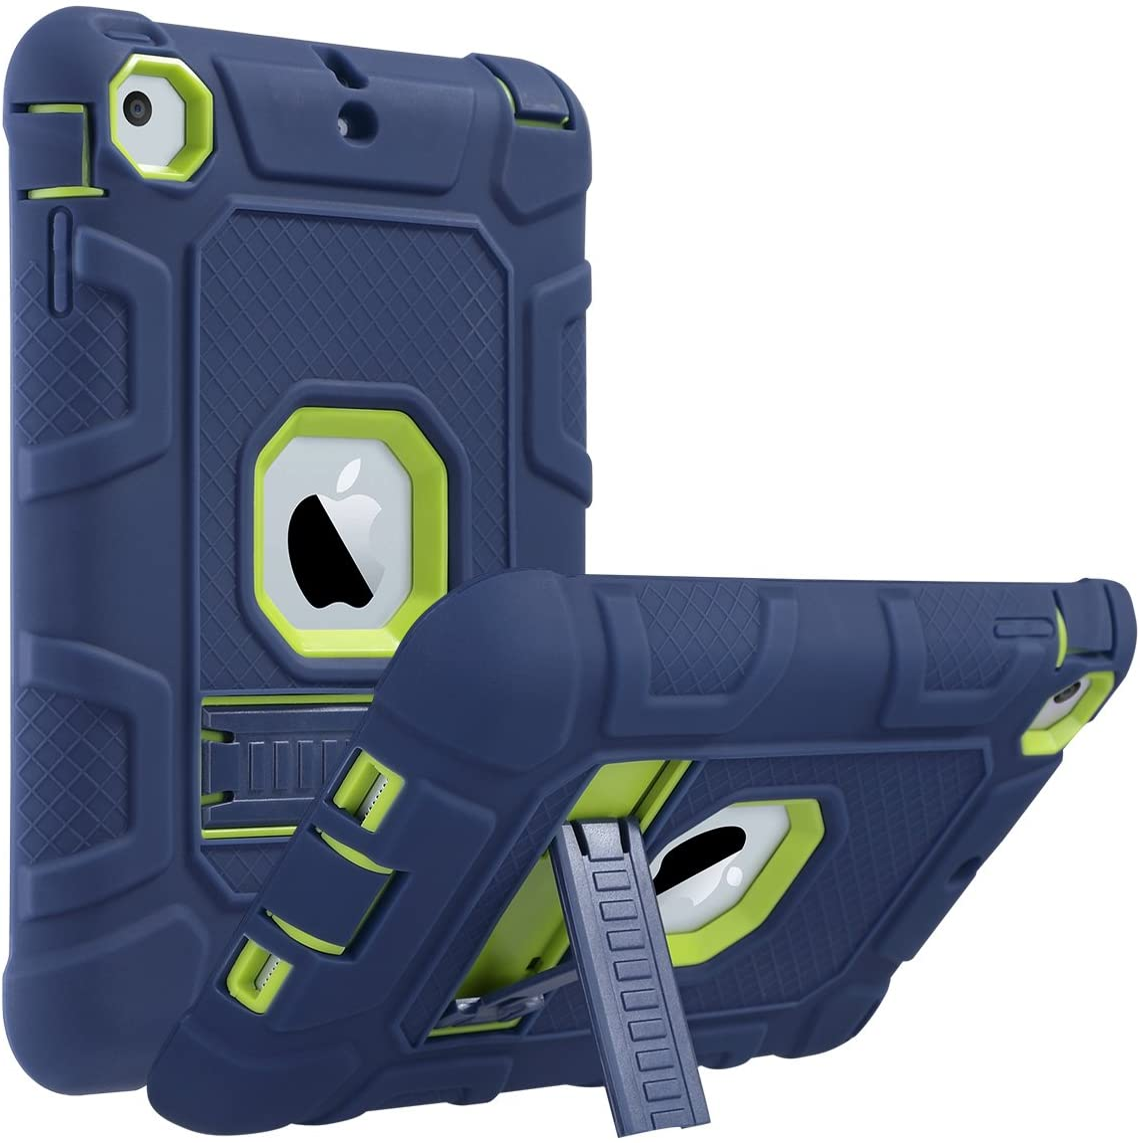 ULAK iPad Mini Case, iPad Mini 2 Case, iPad Mini 3 Case, iPad mini Retina Case, Three Layer Heavy Duty Shockproof Protective Case for iPad Mini,iPad Mini 2,iPad Mini 3 with Kickstand (Blue+Lime Green)